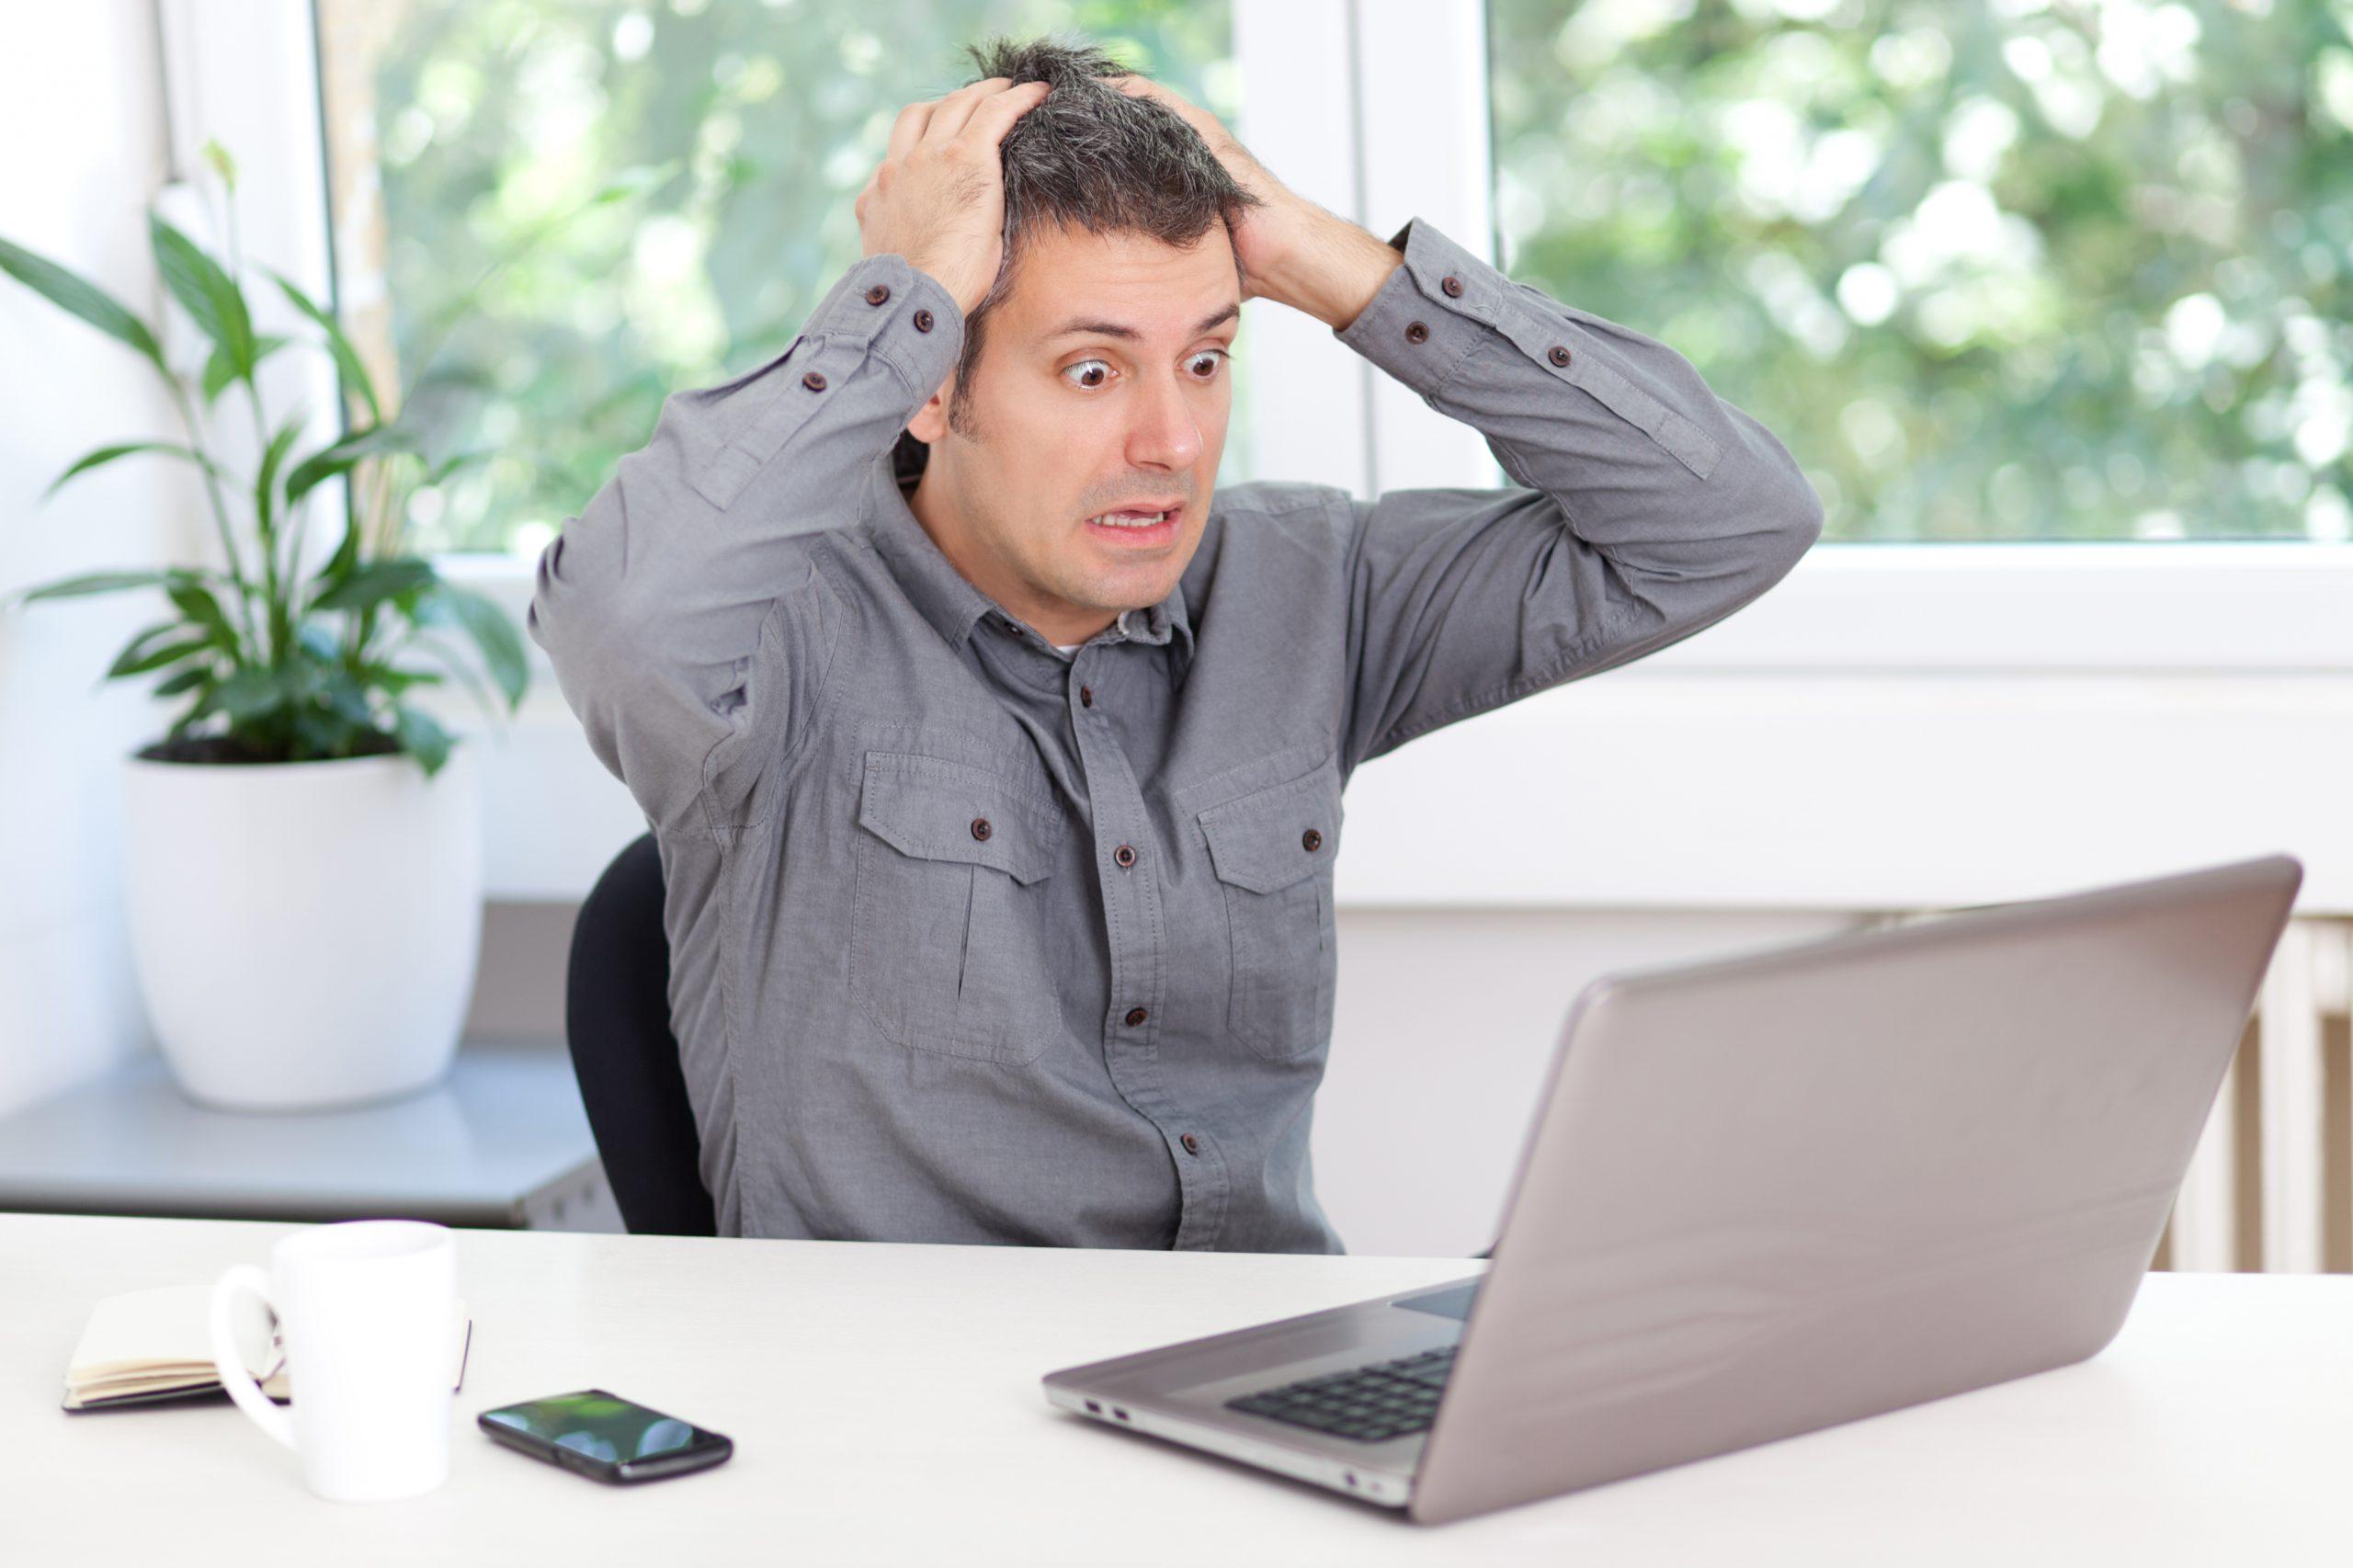 Website User Panicking